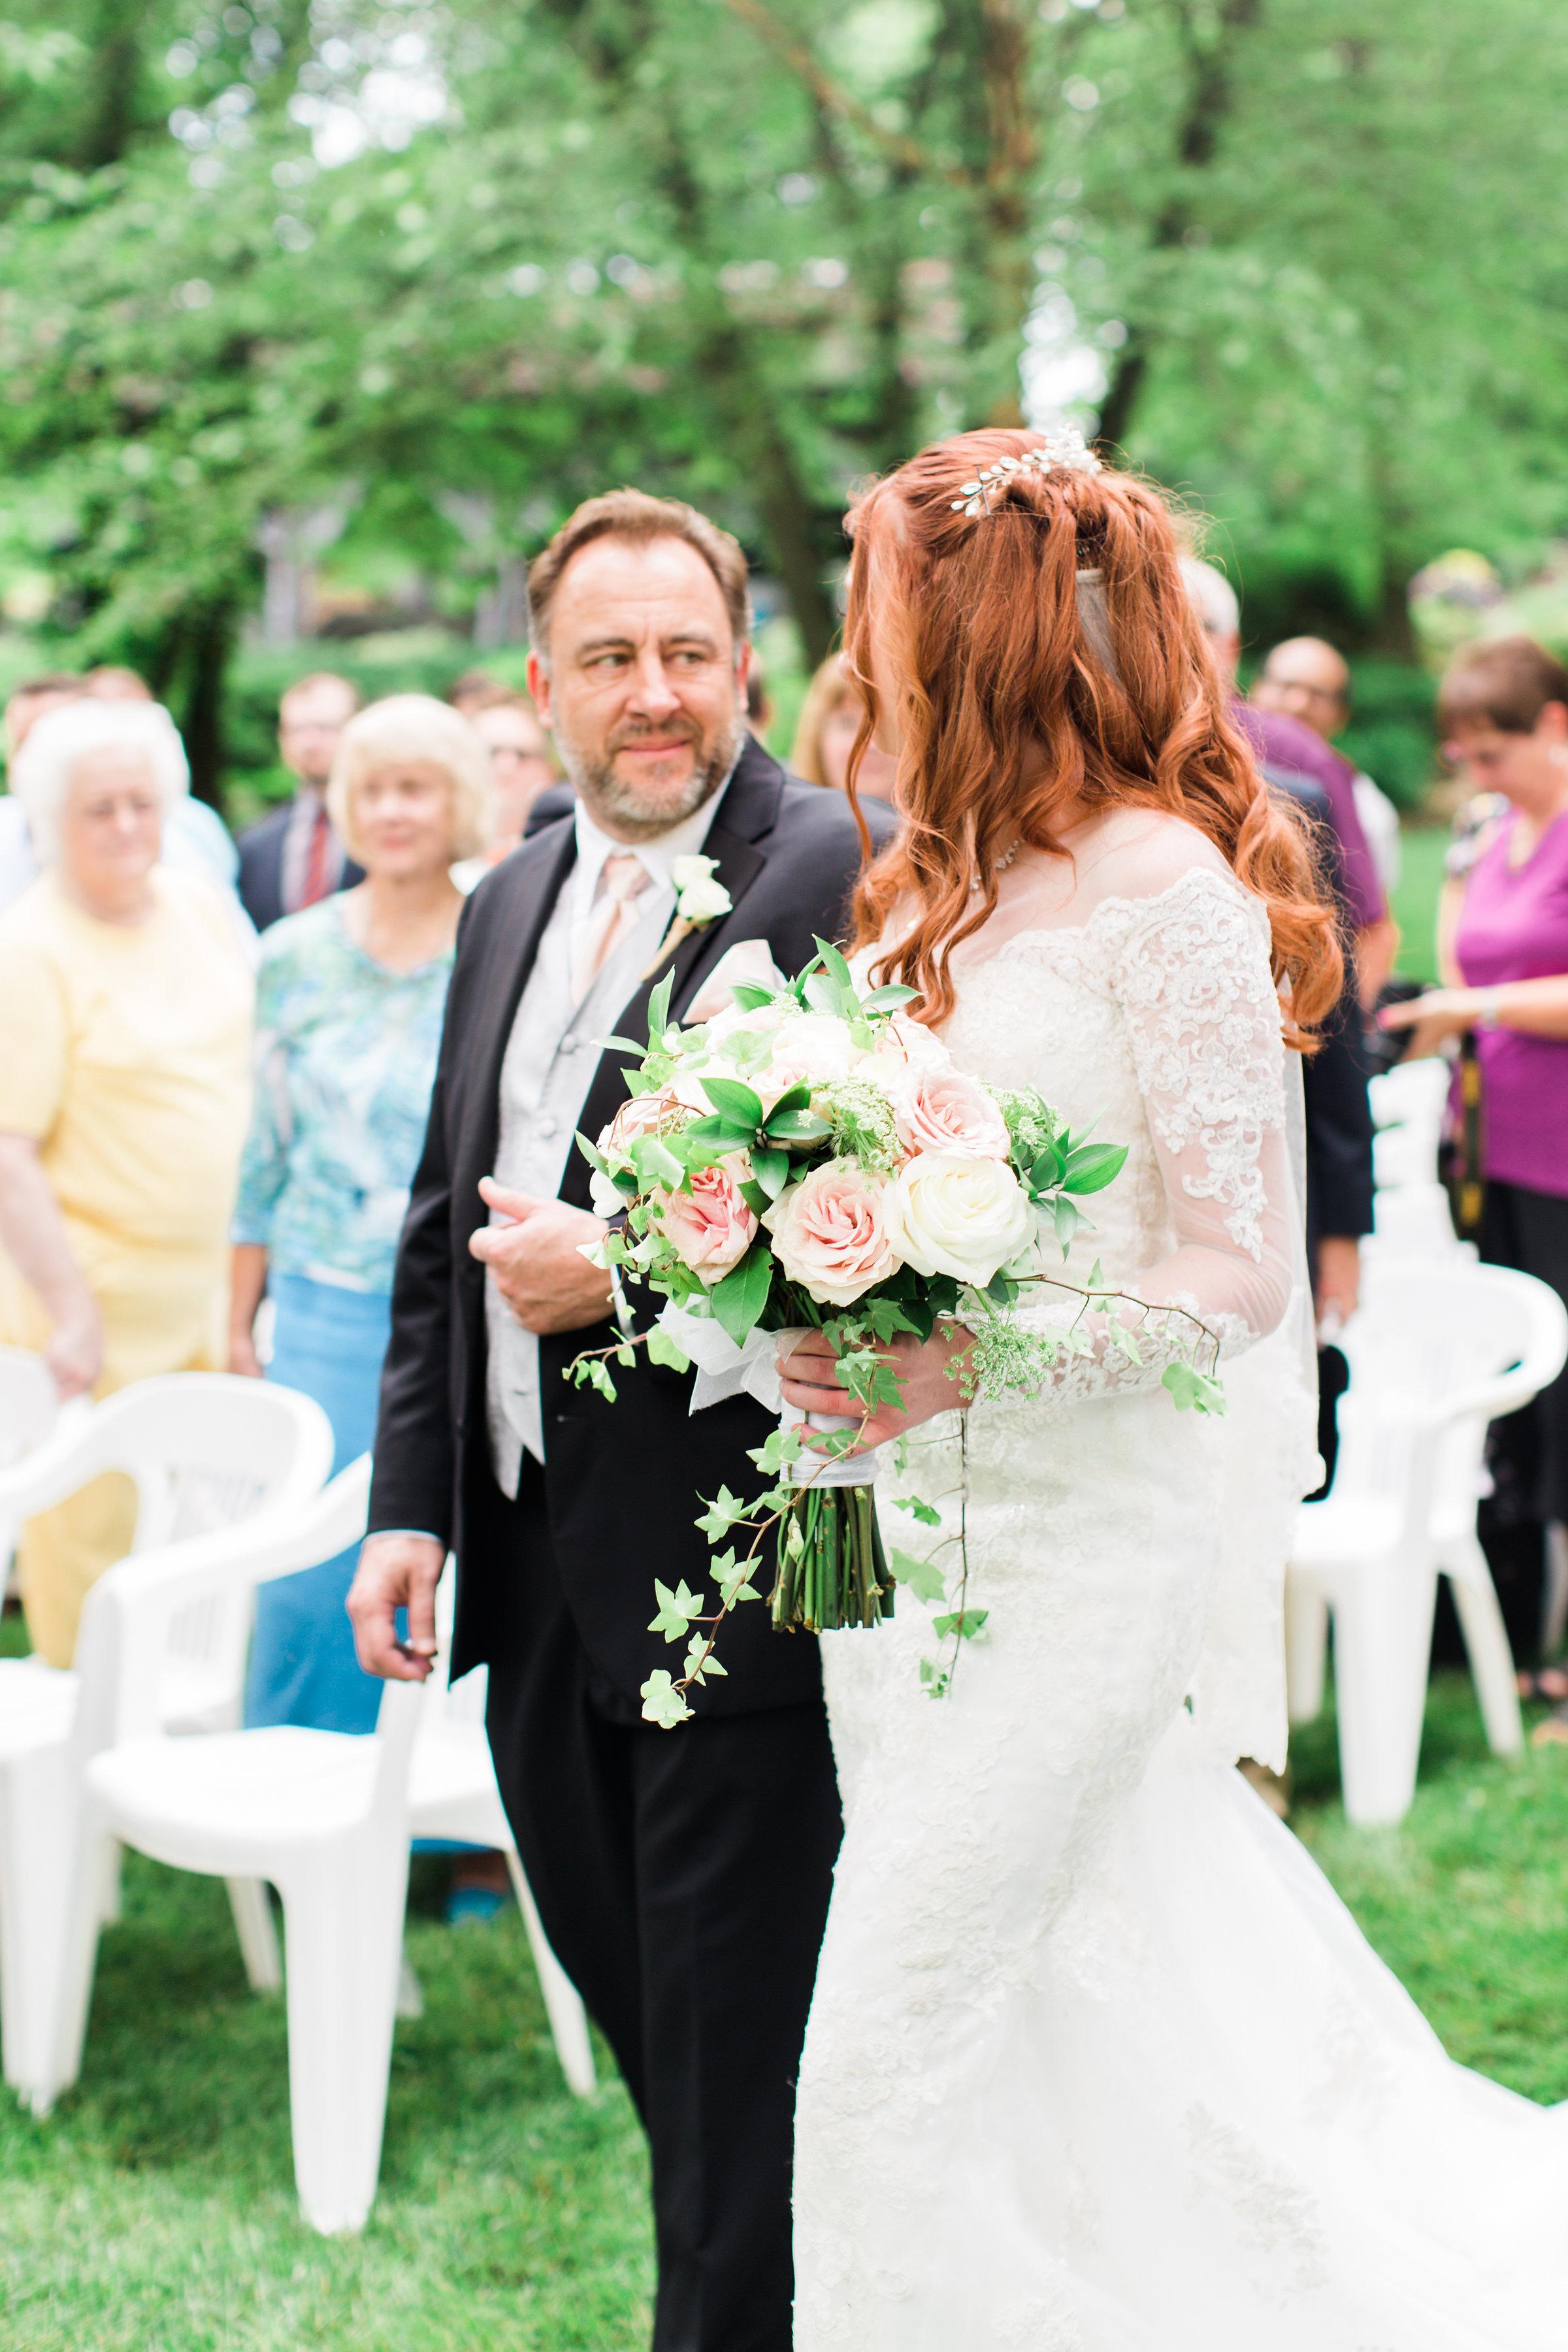 Conger+Wedding+Ceremony-51.jpg